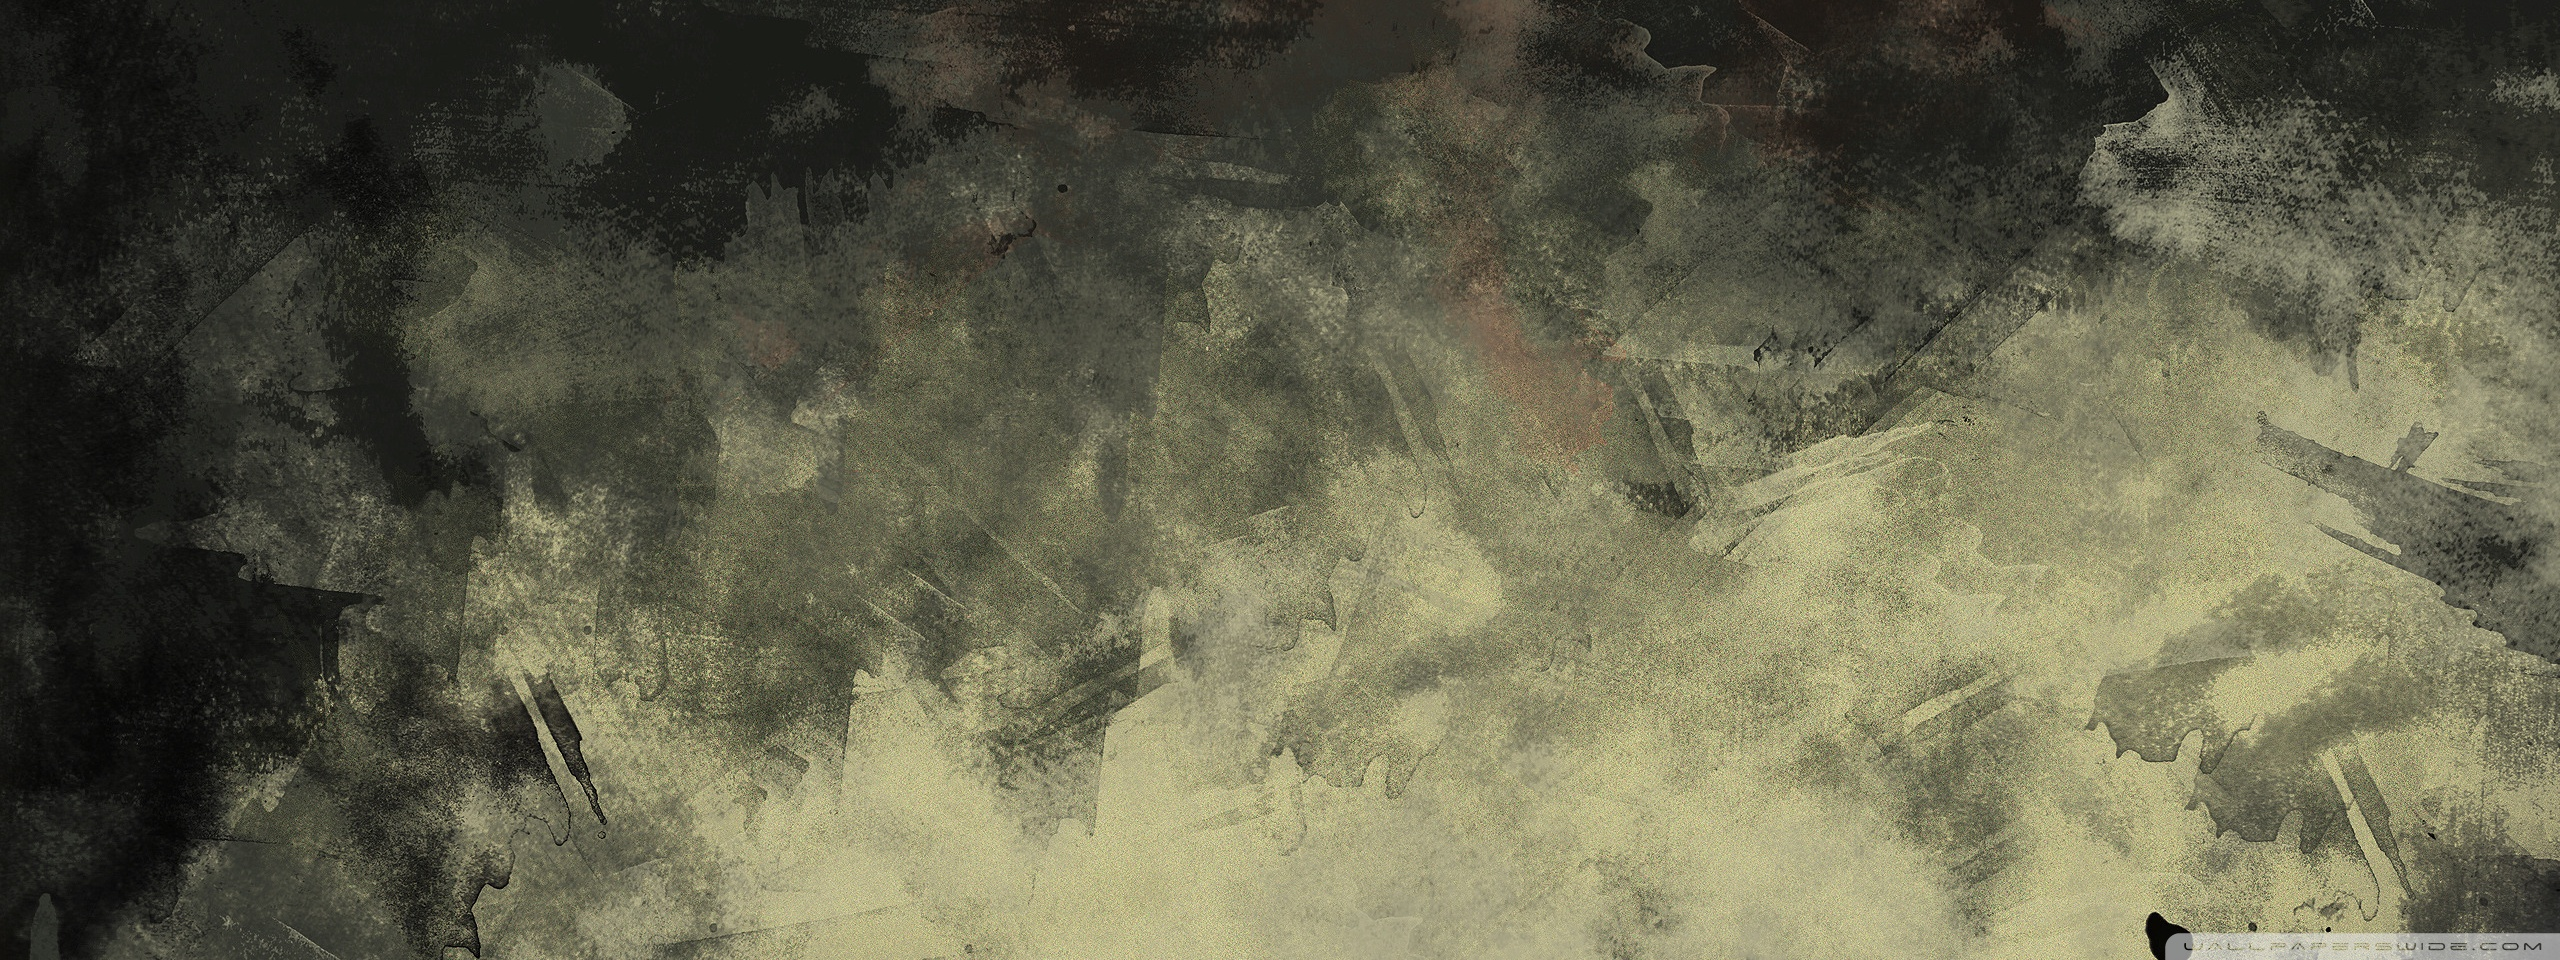 2560x960 Grunge Watercolor Texture 4k Hd Desktop Wallpaper For 4k Ultra